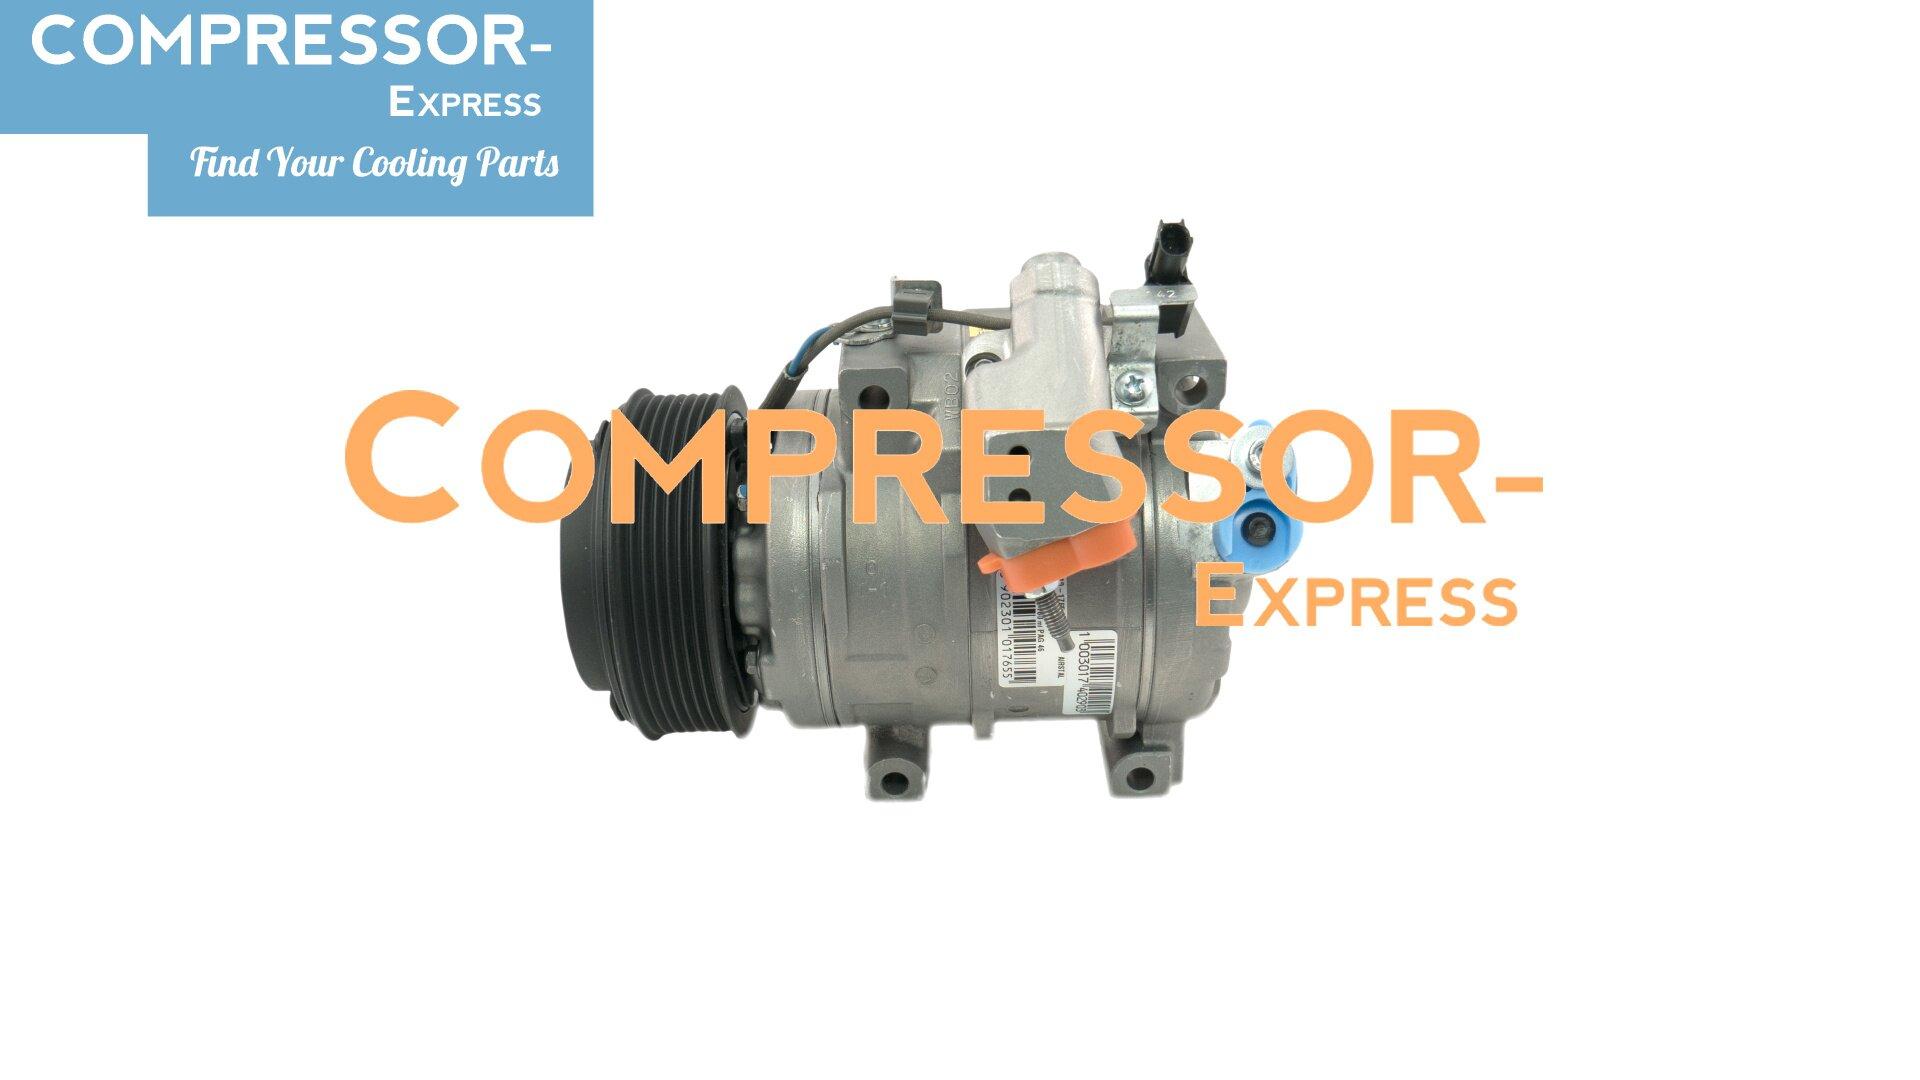 Honda Accord Viii 08 15 Ac Compressor 38810 Rl0 G01 447280 0390 Kompresor New Jazz Ori 50 10sr15c Pv7 Reman